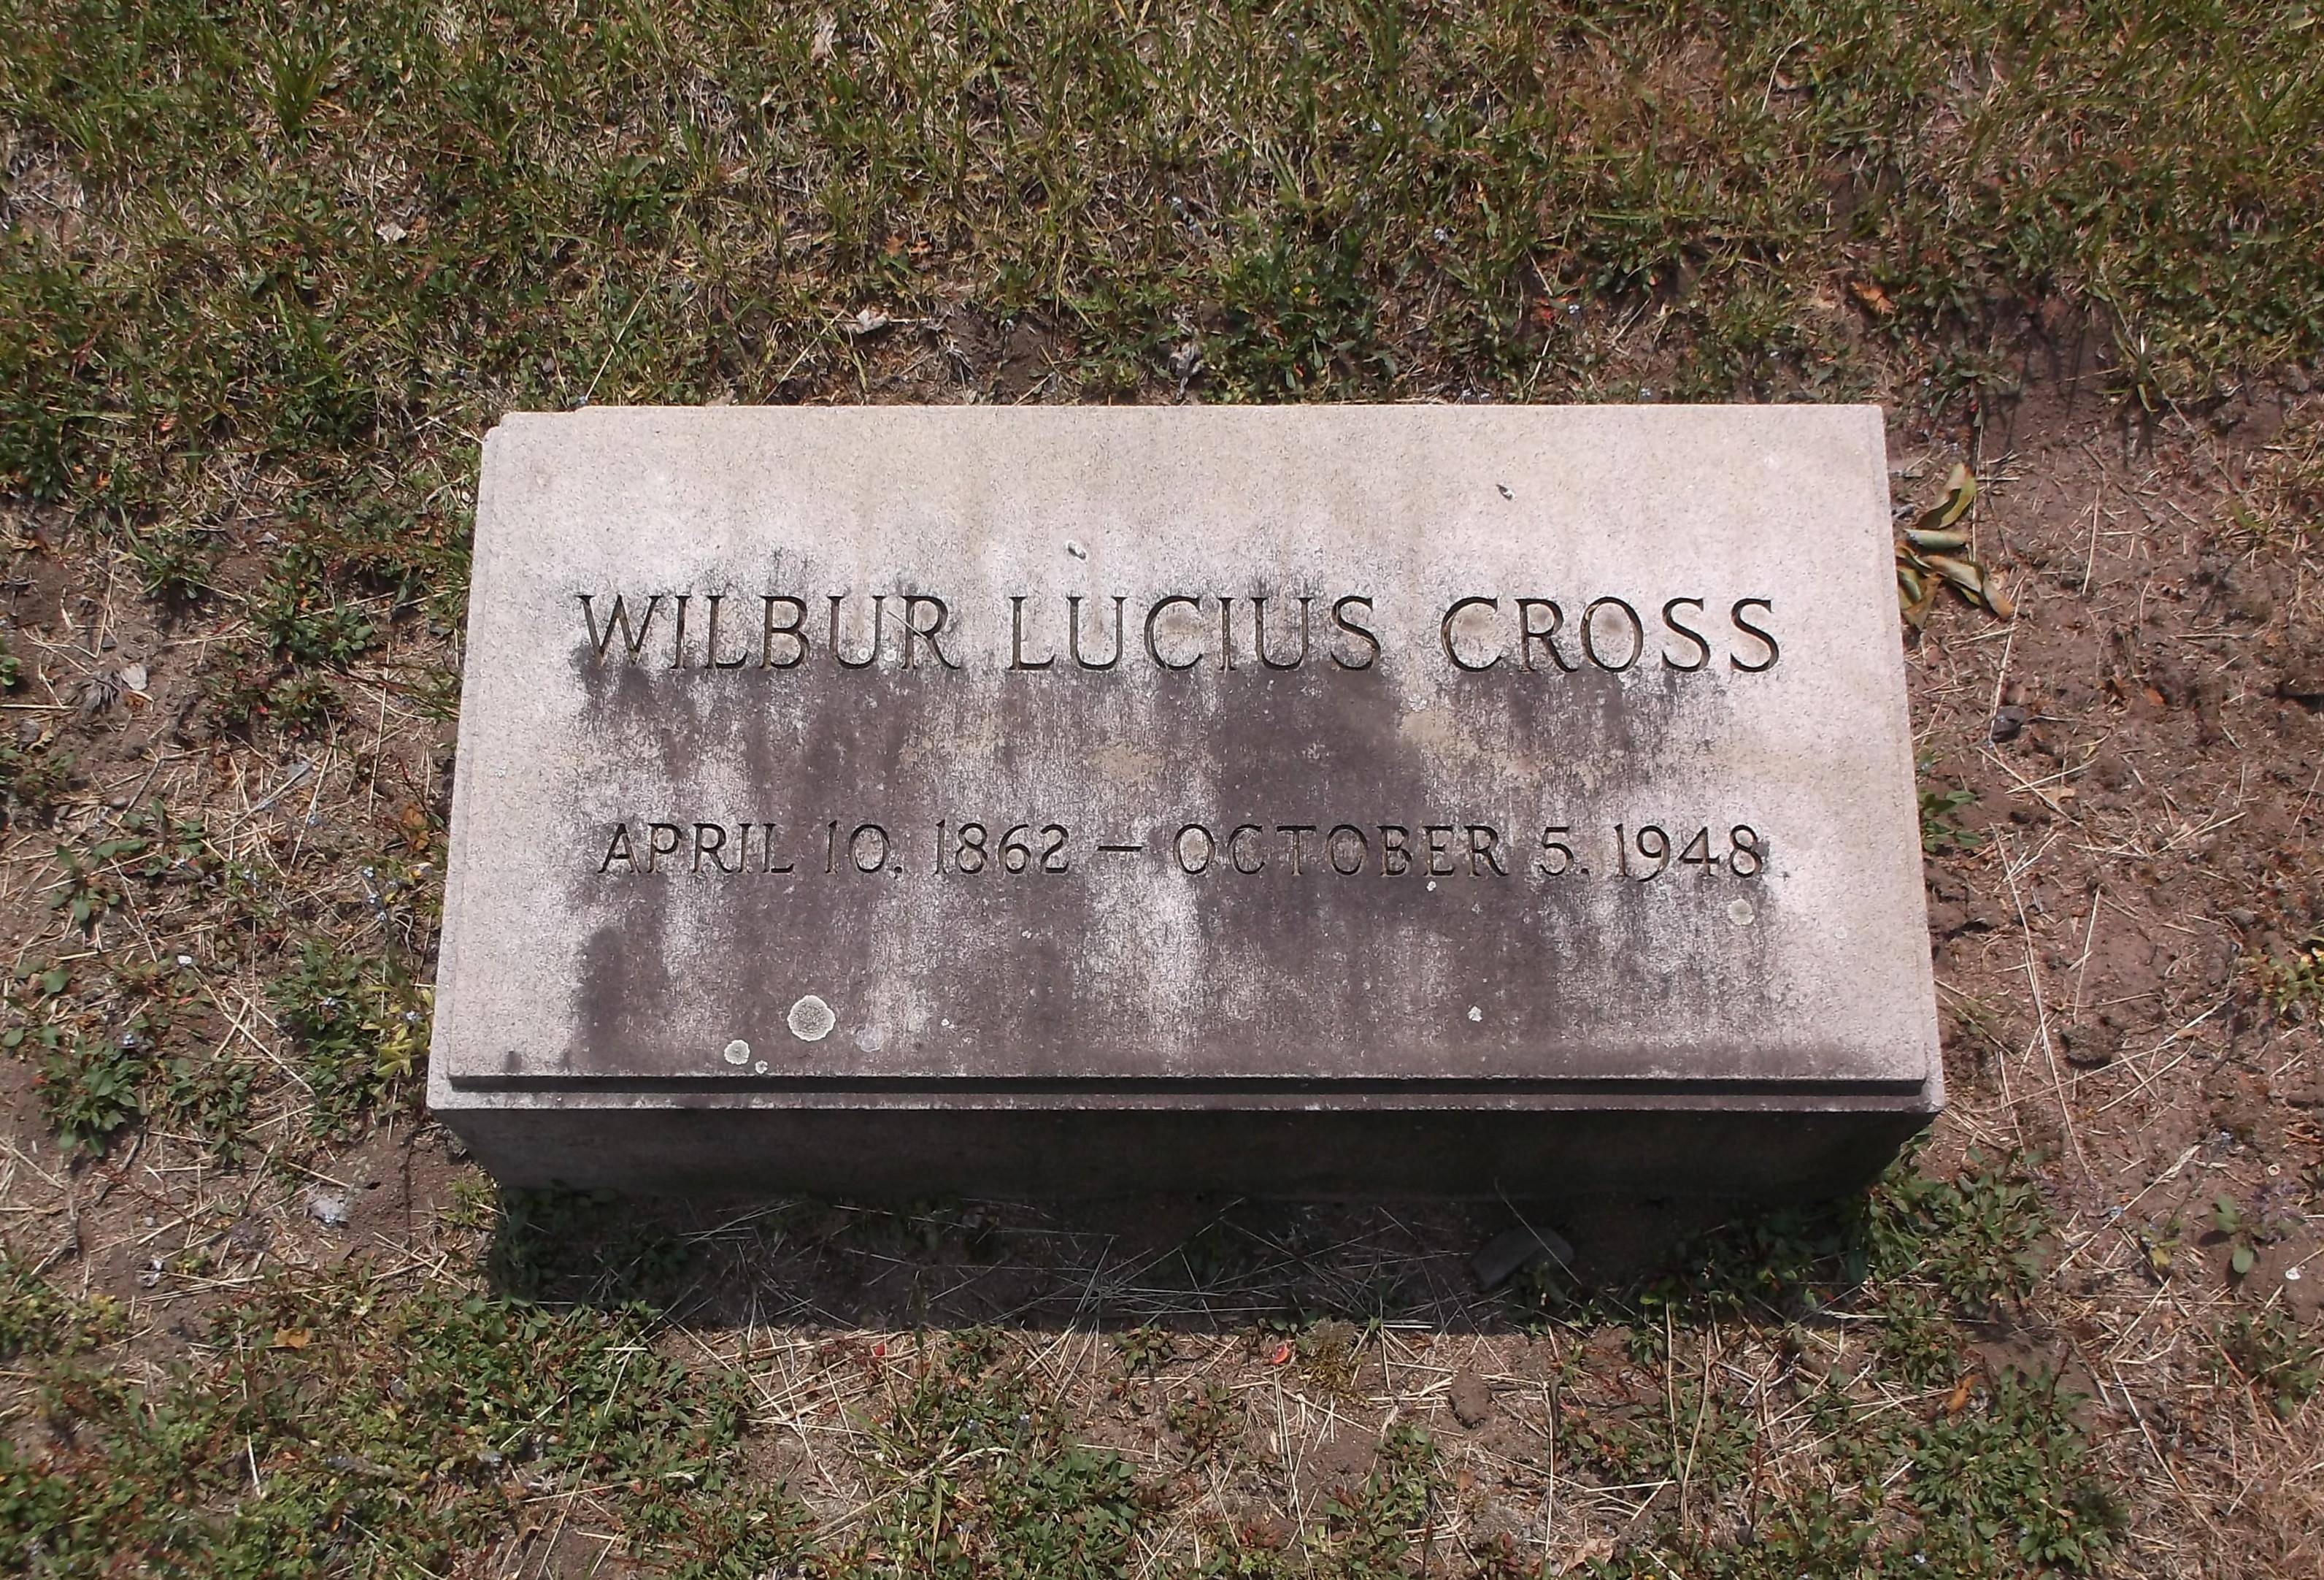 Wilbur Lucius Cross